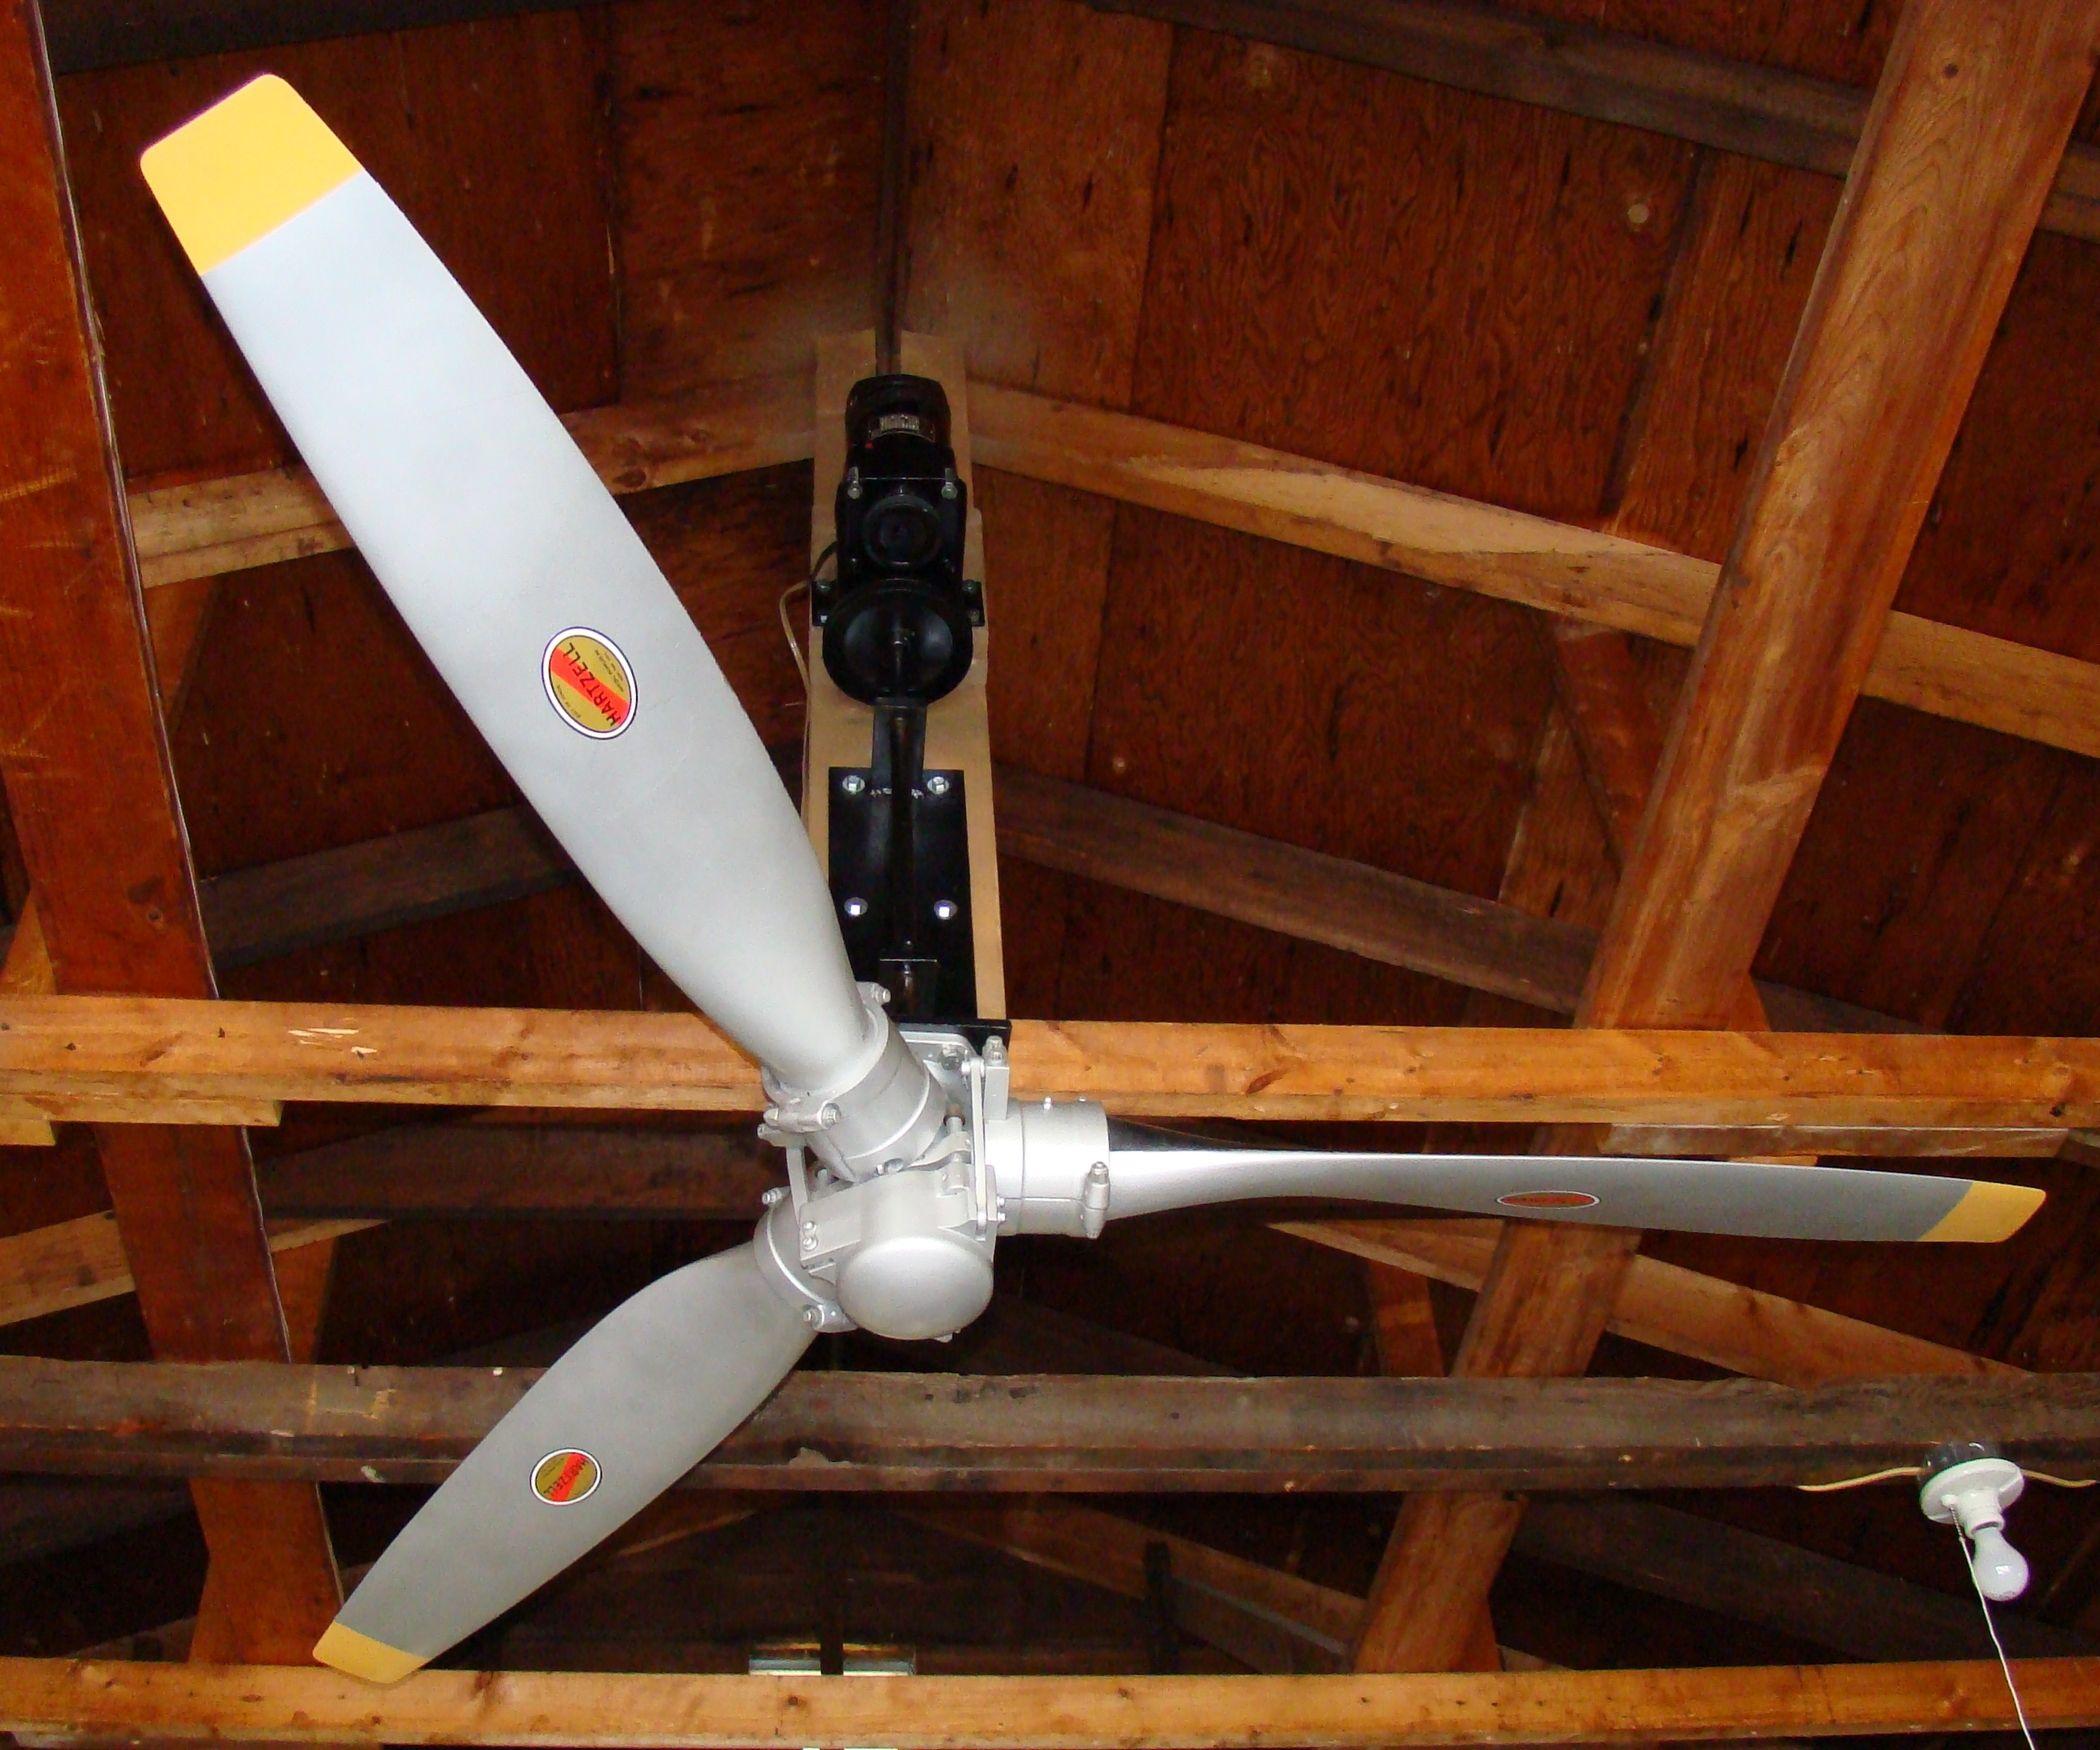 Airplane Propeller Ceiling Fan Airplane Ceiling Fan Propeller Ceiling Fan Airplane Decor